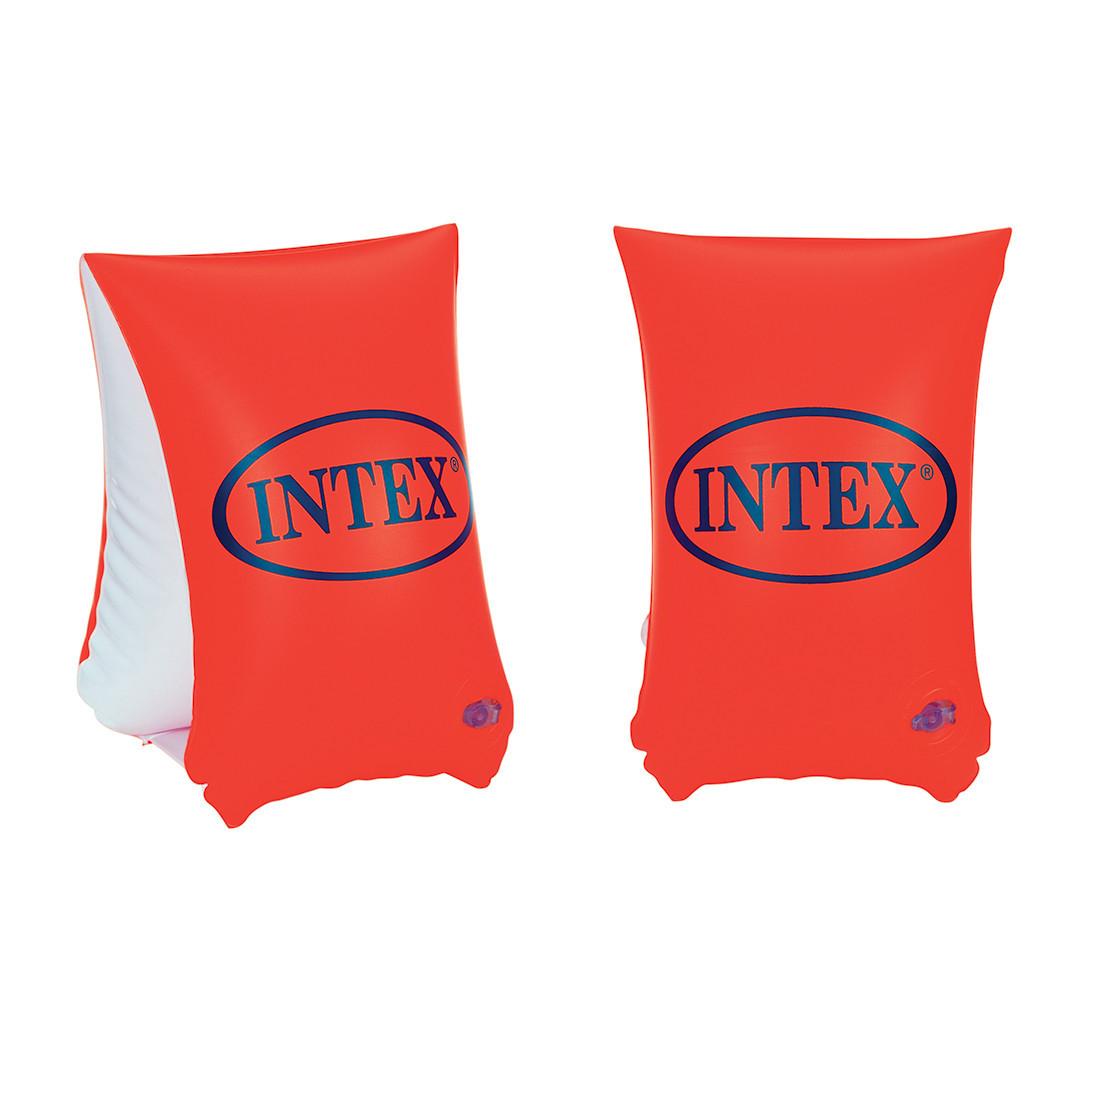 Нарукавники для плавания Deluxe Large 30 x 15 см  INTEX  58641NP  Винил  6+